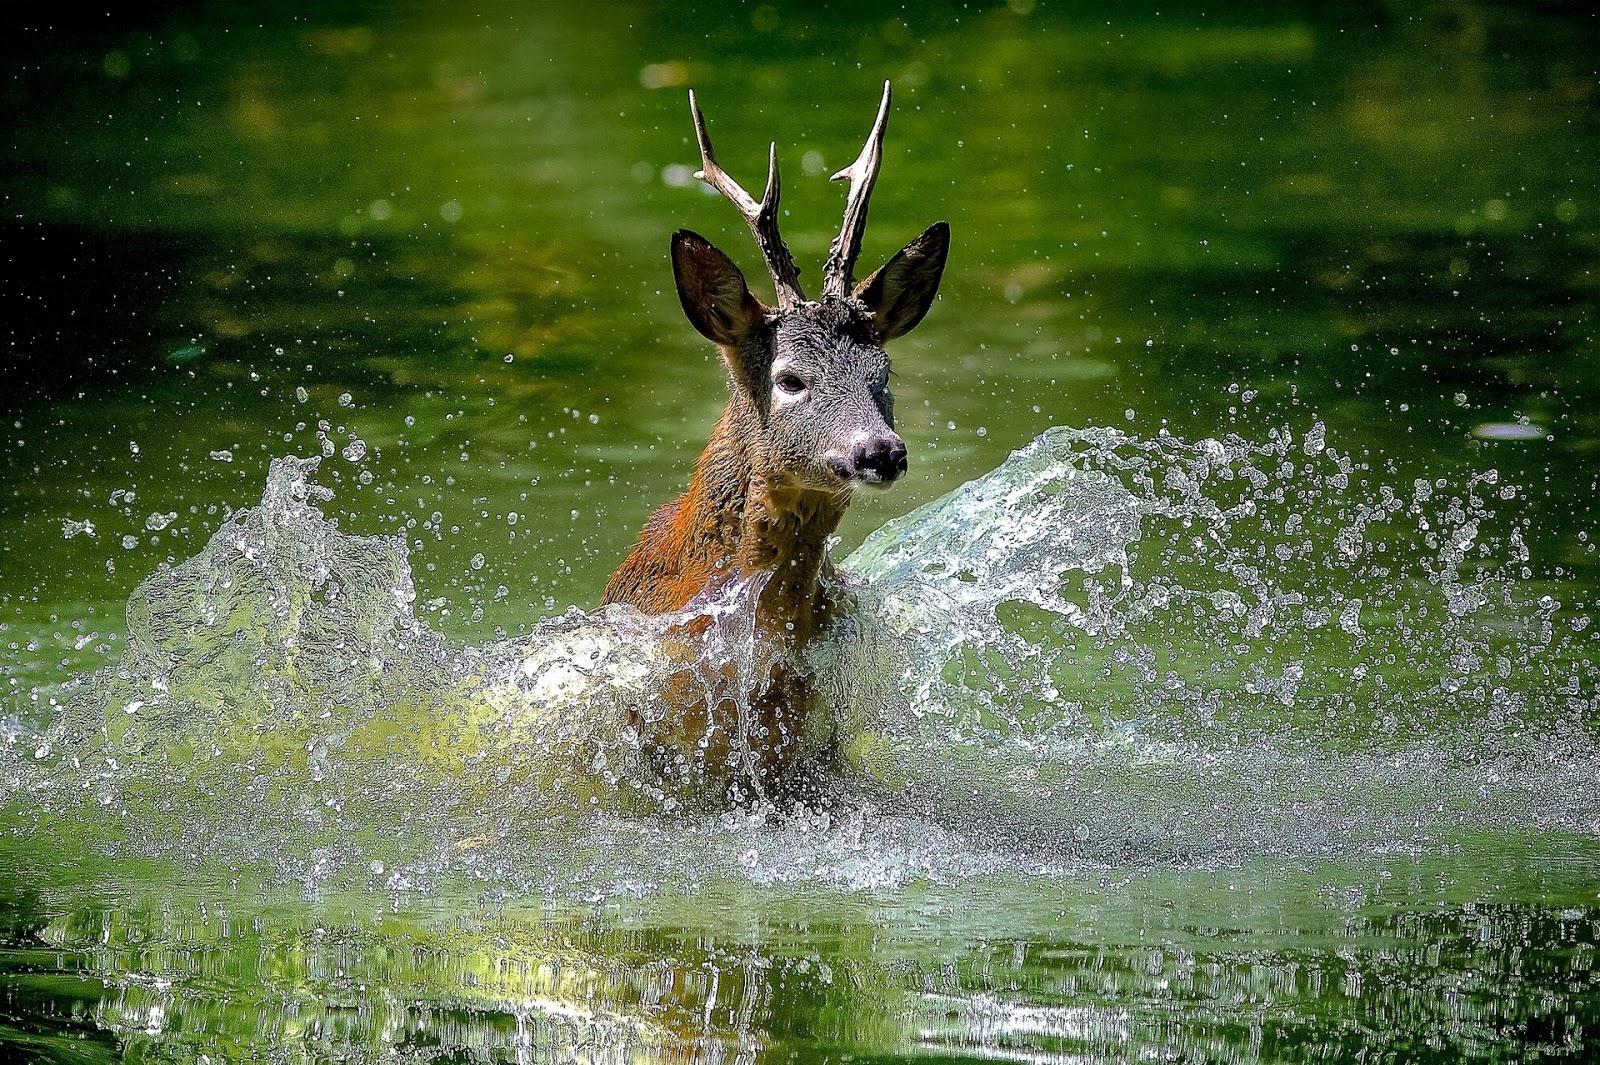 beautiful frog wallpaper download for free: beautiful deer animals